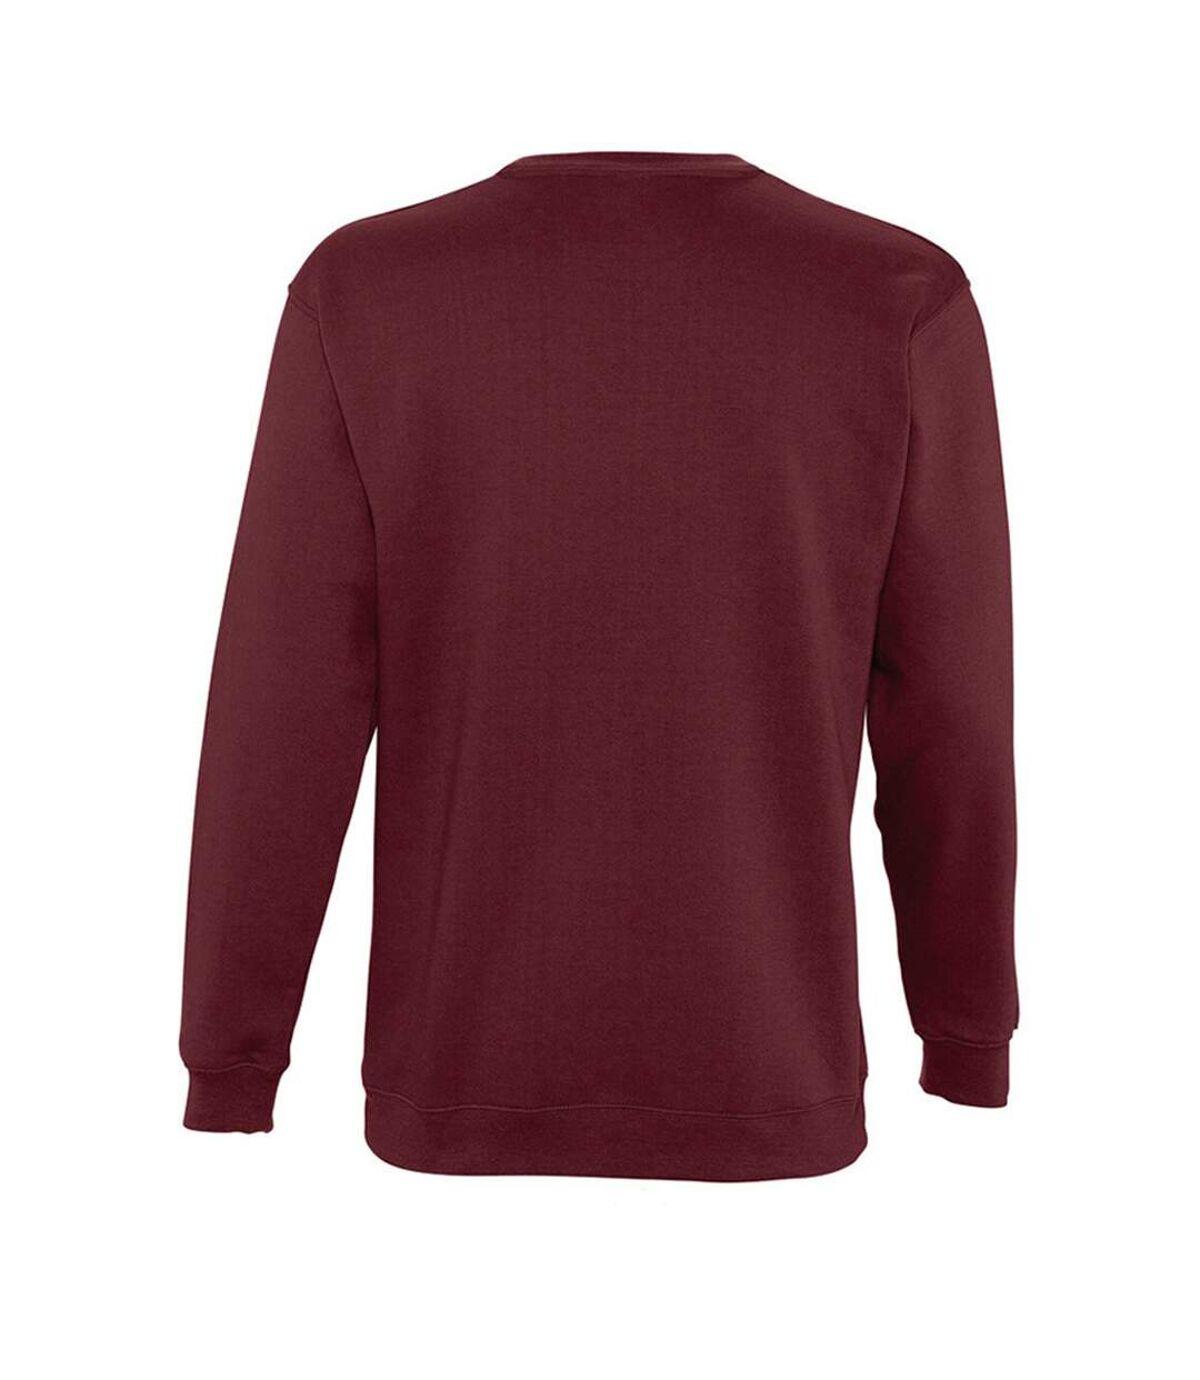 SOLS Unisex Supreme Sweatshirt (Burgundy) - UTPC2837